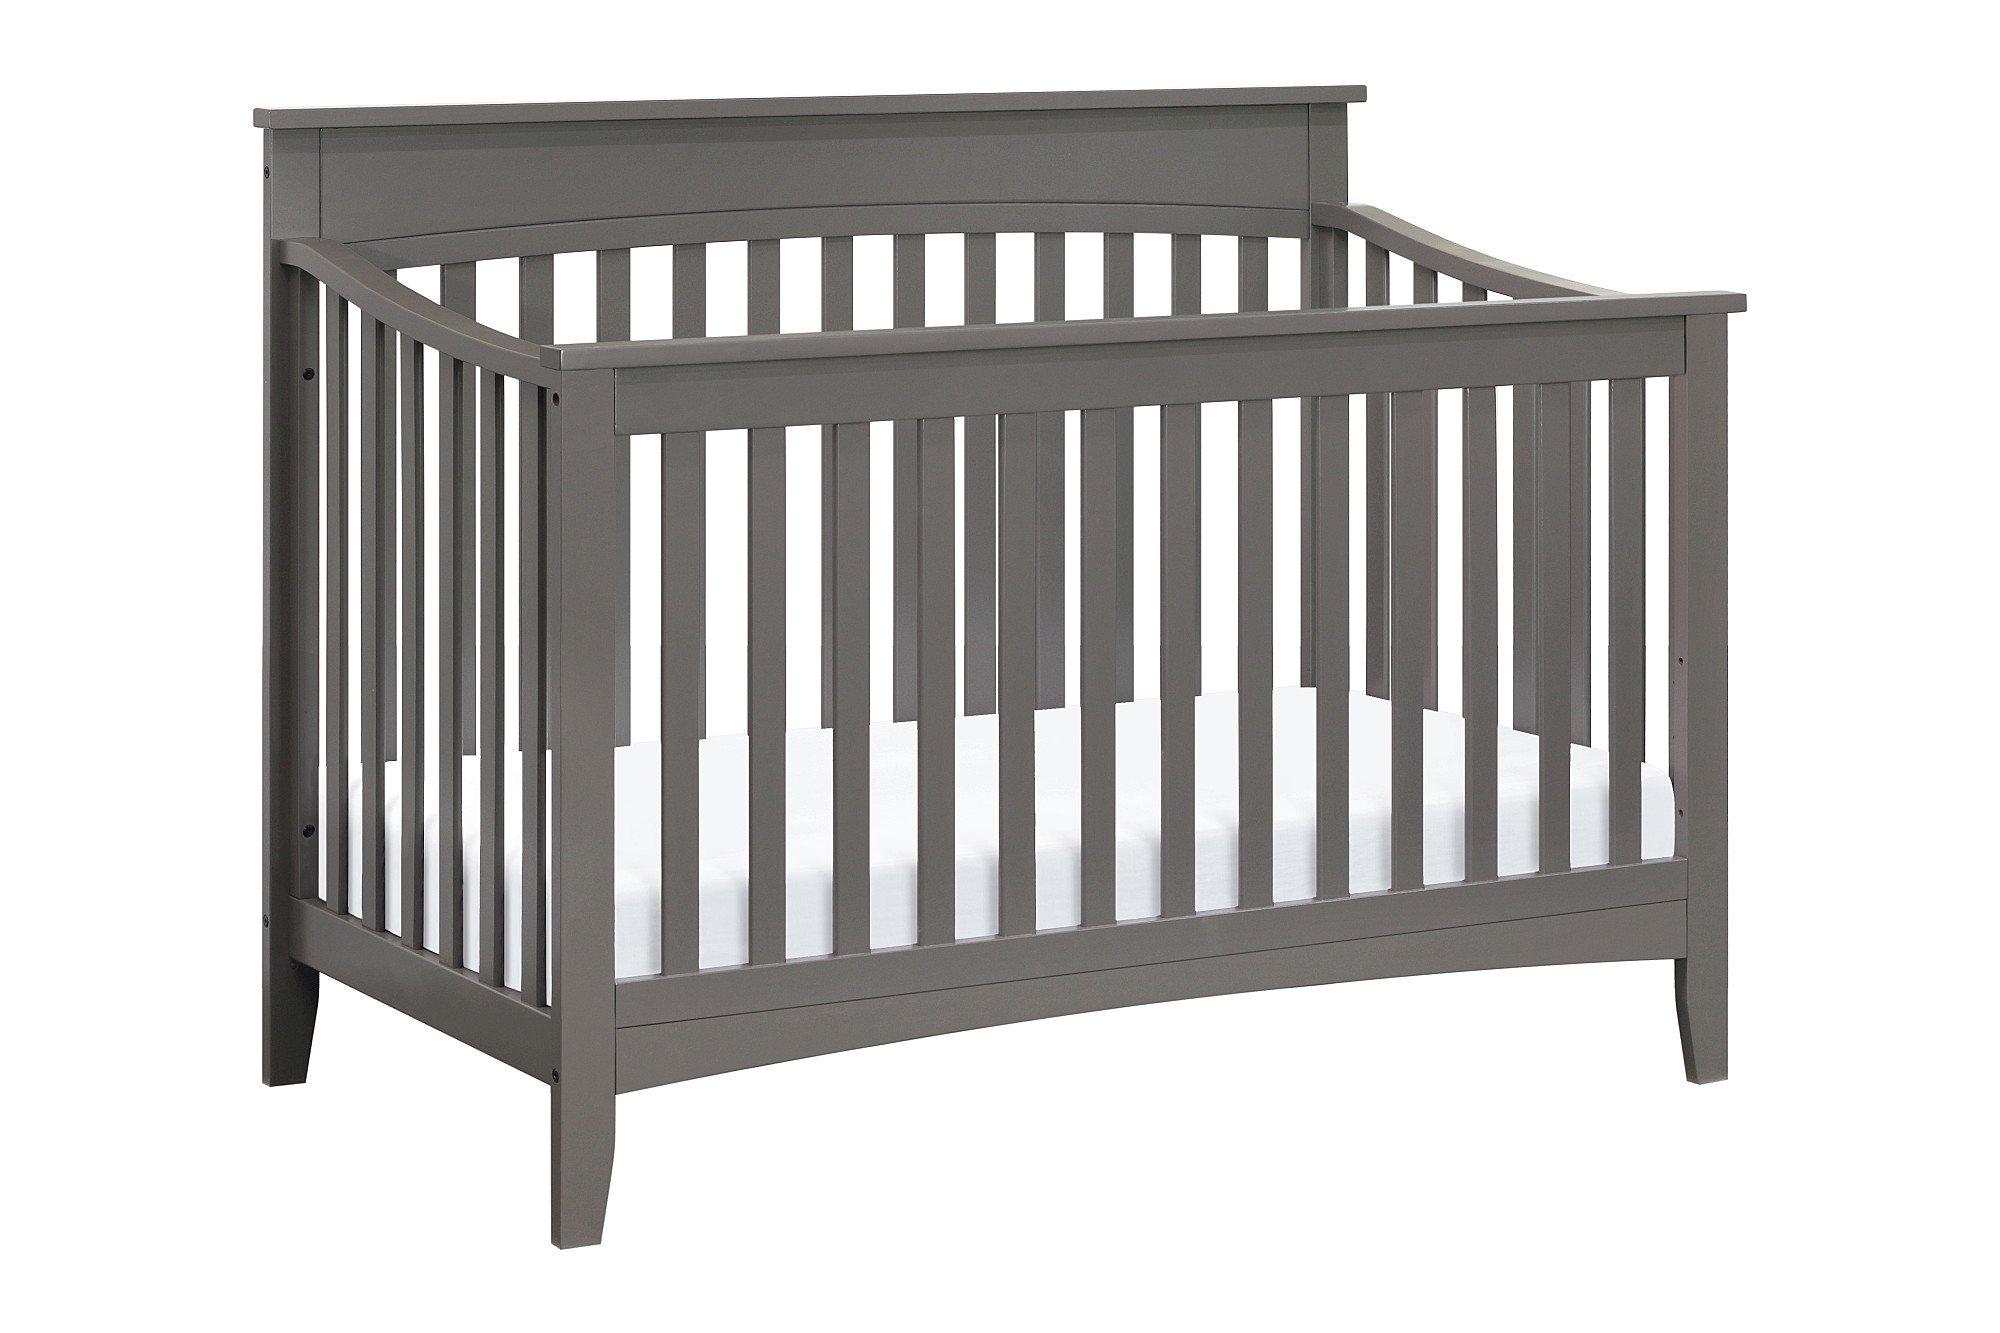 DaVinci Grove 4-in-1 Crib Full Size Conversion Kit Bed Rails - Slate